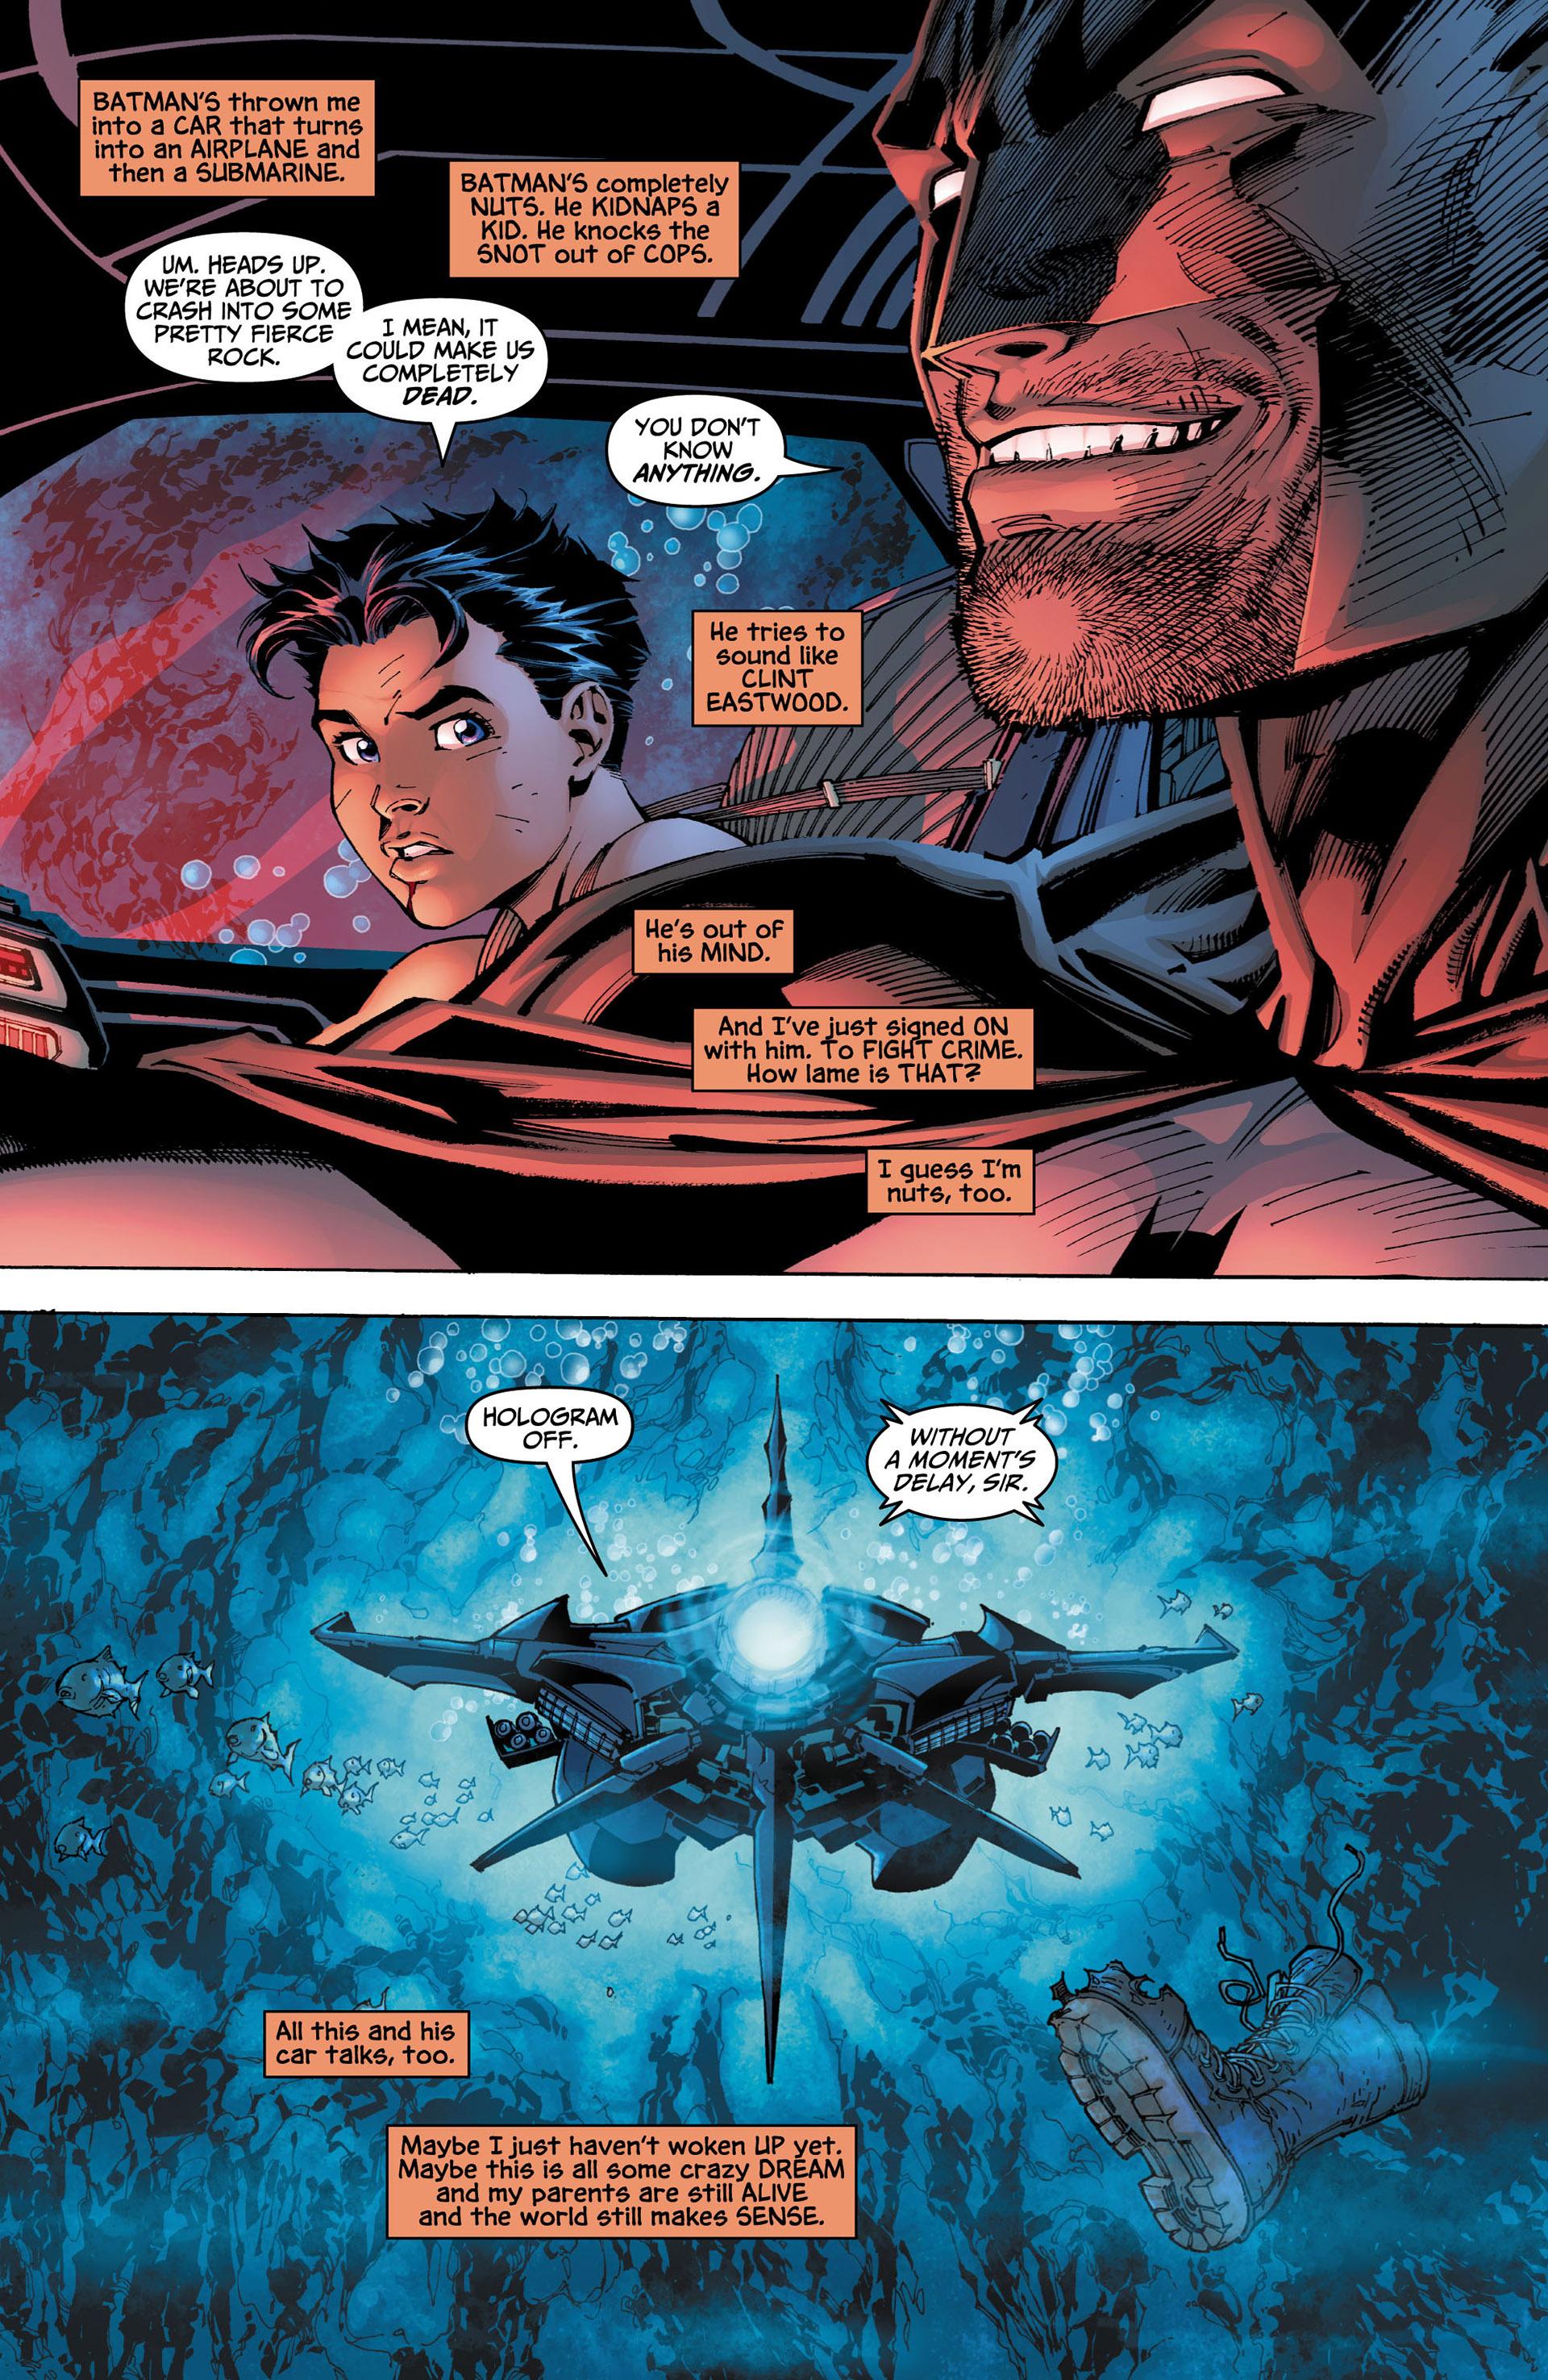 Read online All Star Batman & Robin, The Boy Wonder comic -  Issue #4 - 5